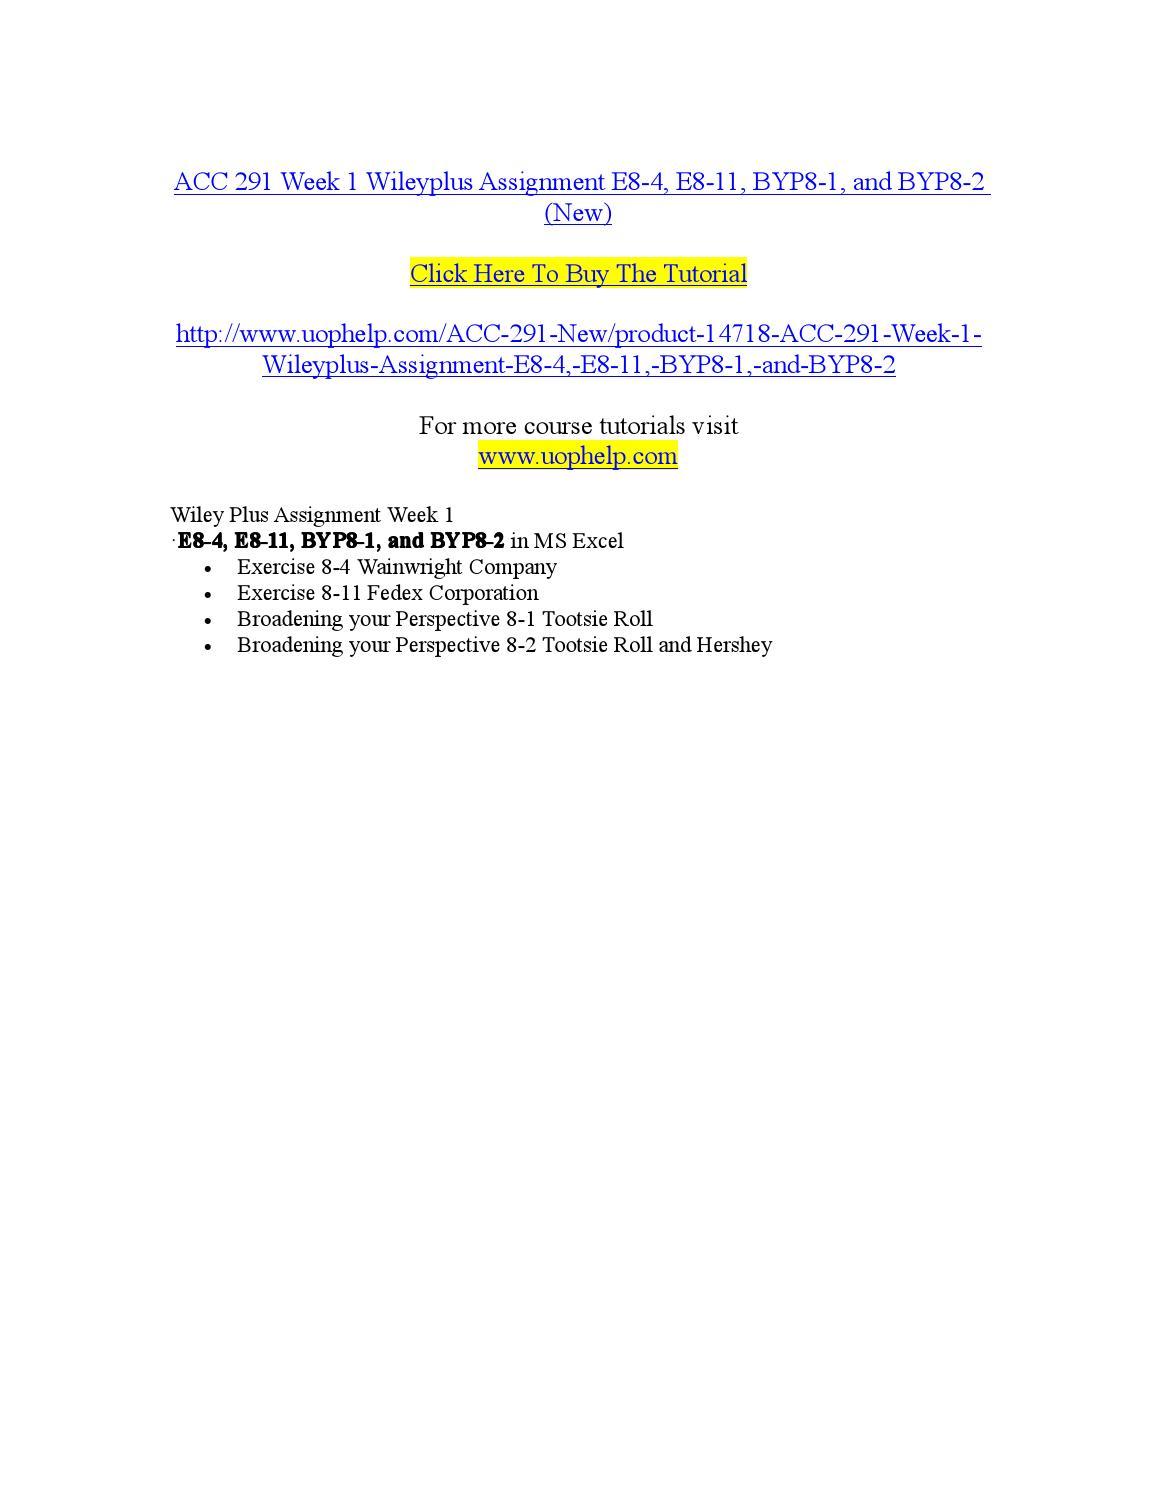 wiley acc 291 week 5 e13 8 Body preview (15 words) your xxx 291 xxxx 5 wiley xxxx assignment is attached xxxxxx xxxxxxx xx xxx xxx queries,thanks file1docx preview (611 words.